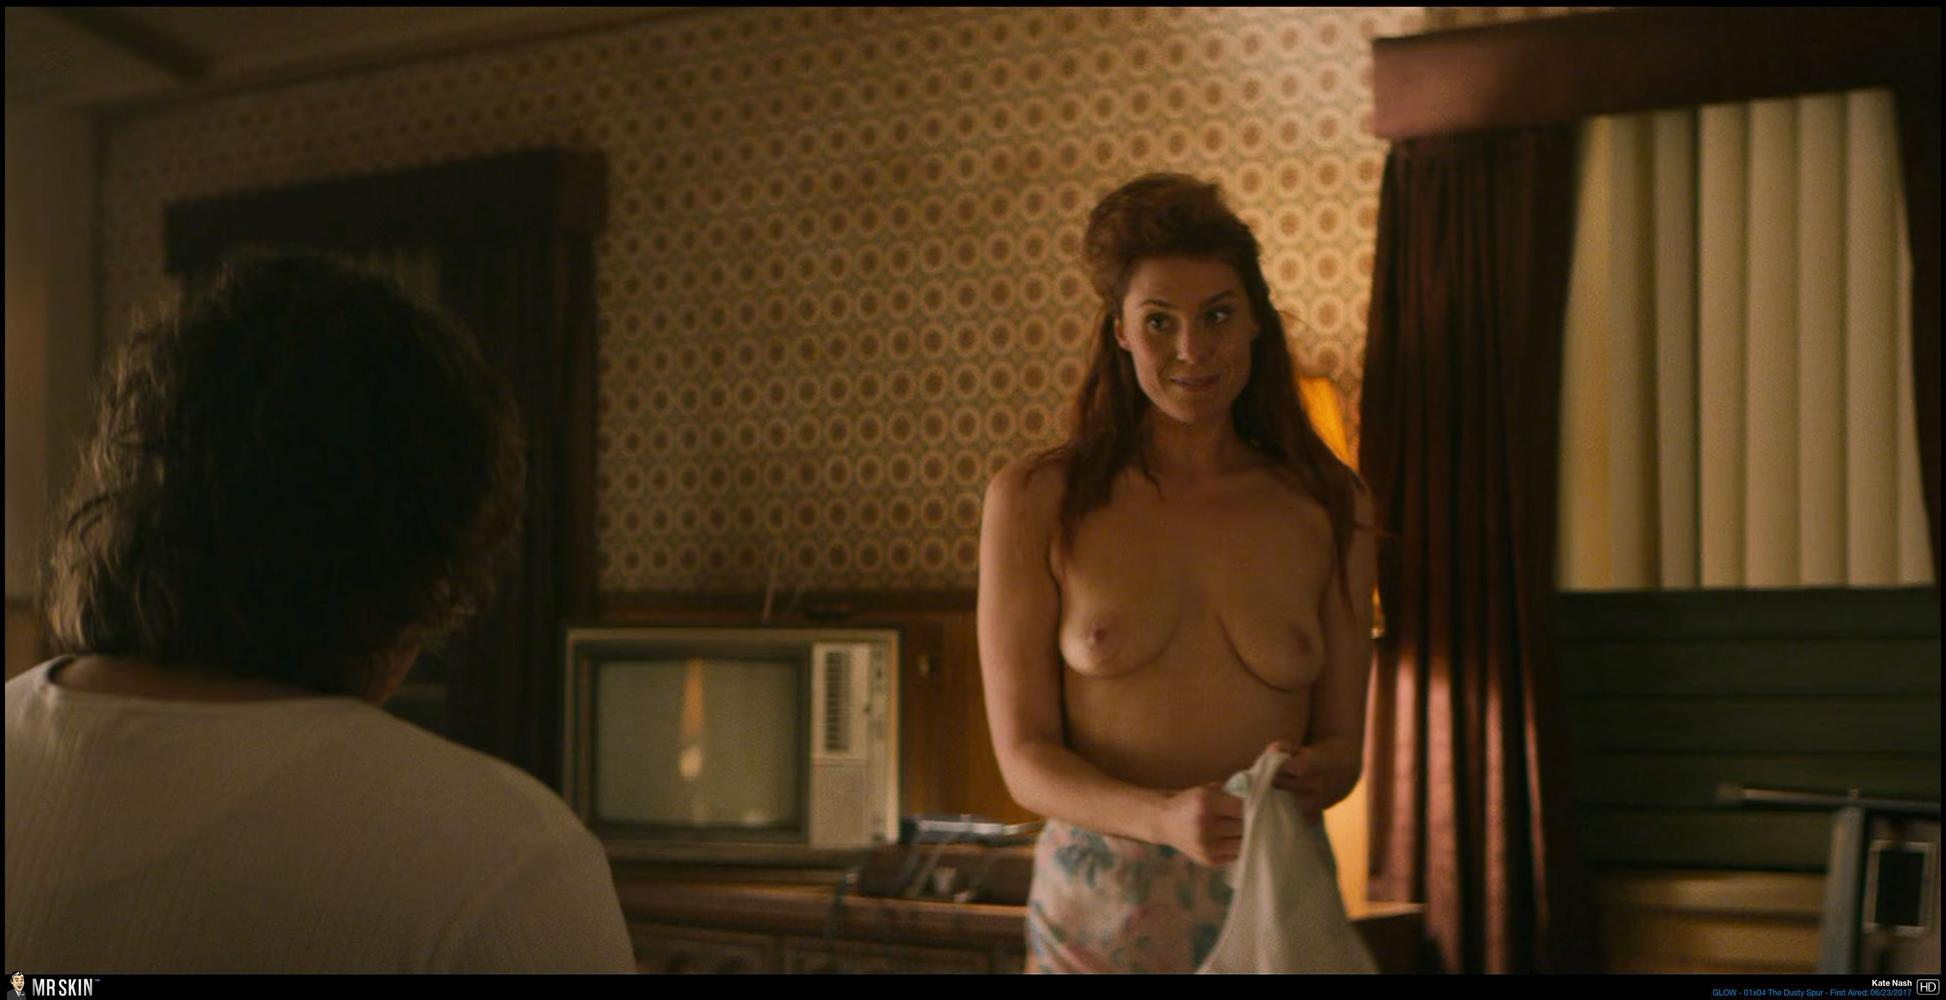 Haley bennett and roxane mesquida nude kaboom 5